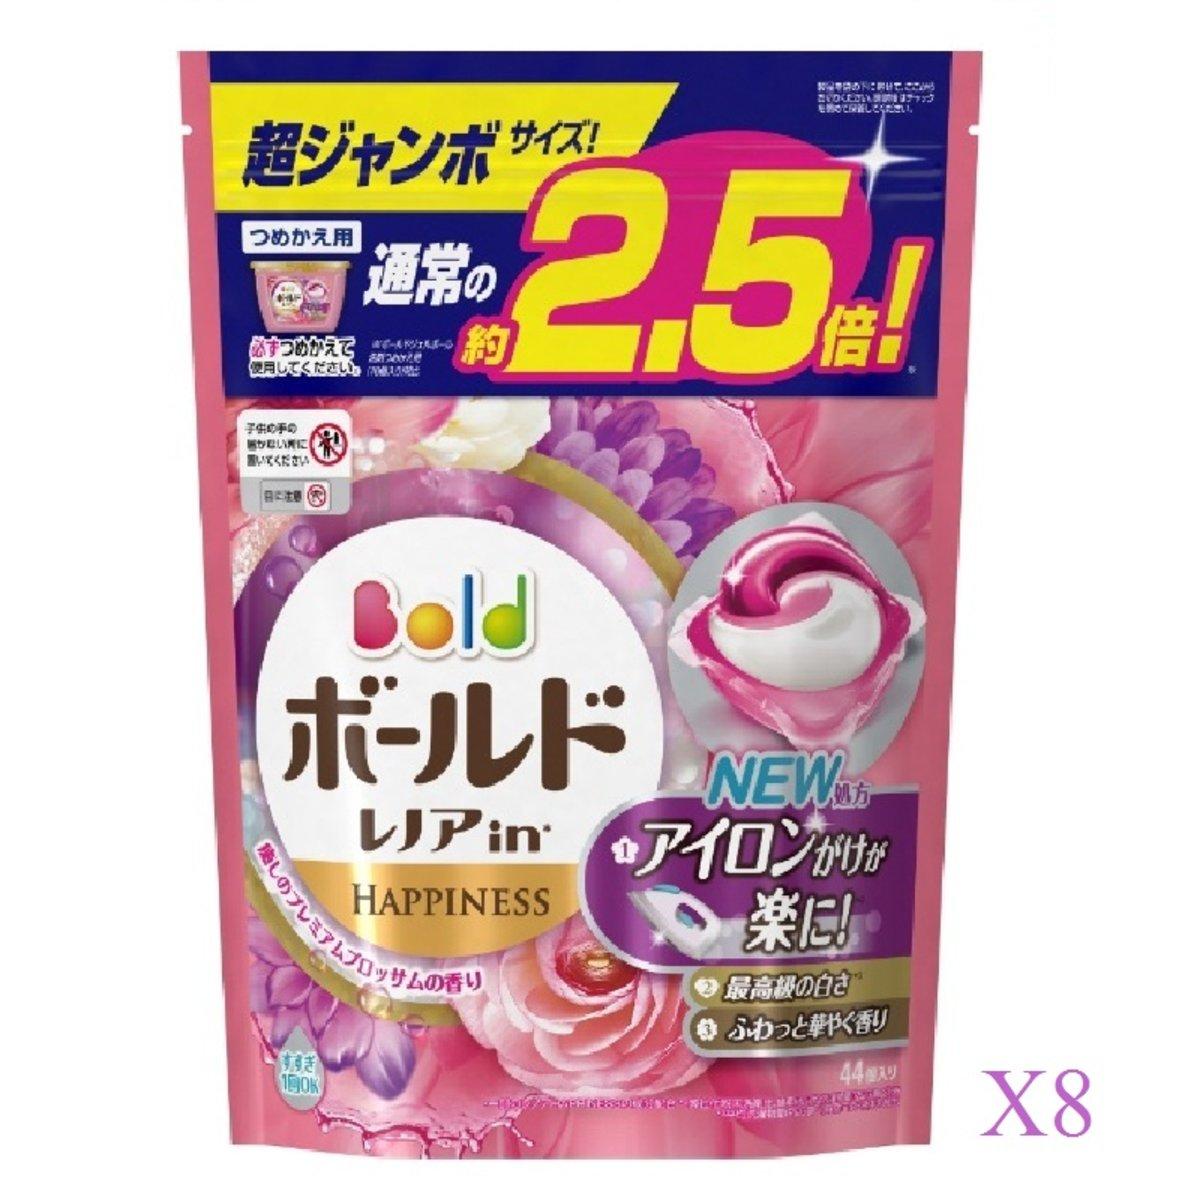 BOLD 3D花香洗衣球-典雅牡丹超特大補充裝(粉紅)  44pcsX8